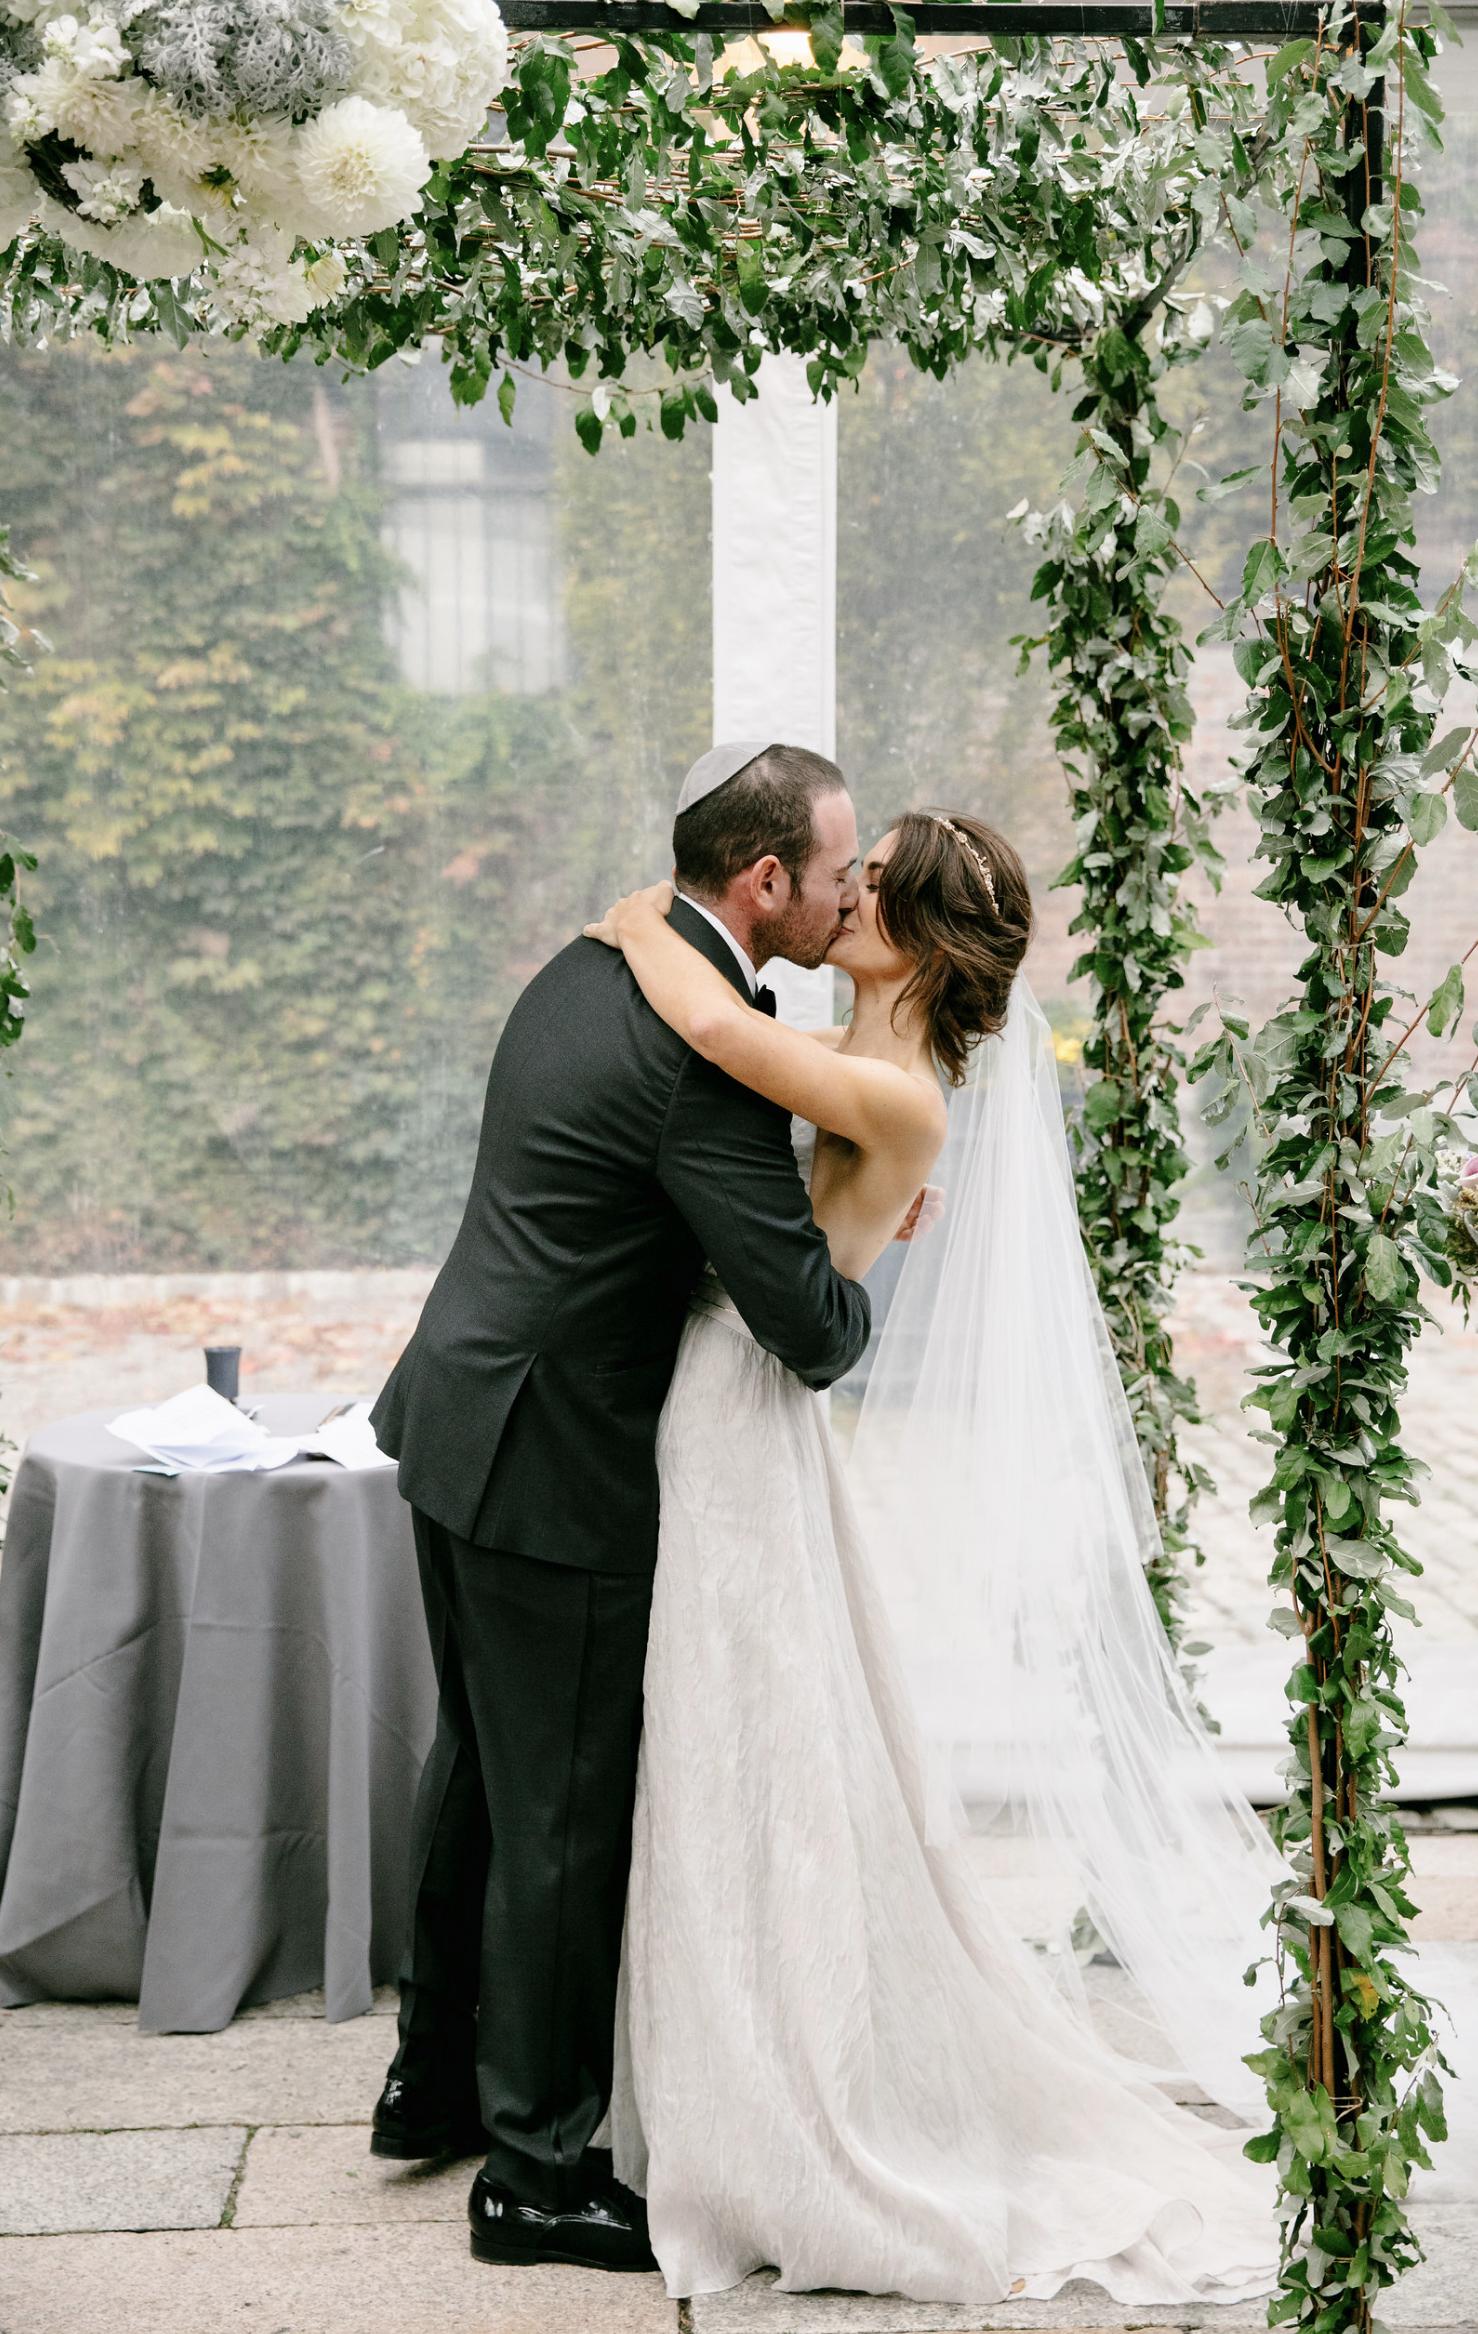 Carol Hannah Bridal L'Elysee Gown Jenna Wedding 29.png